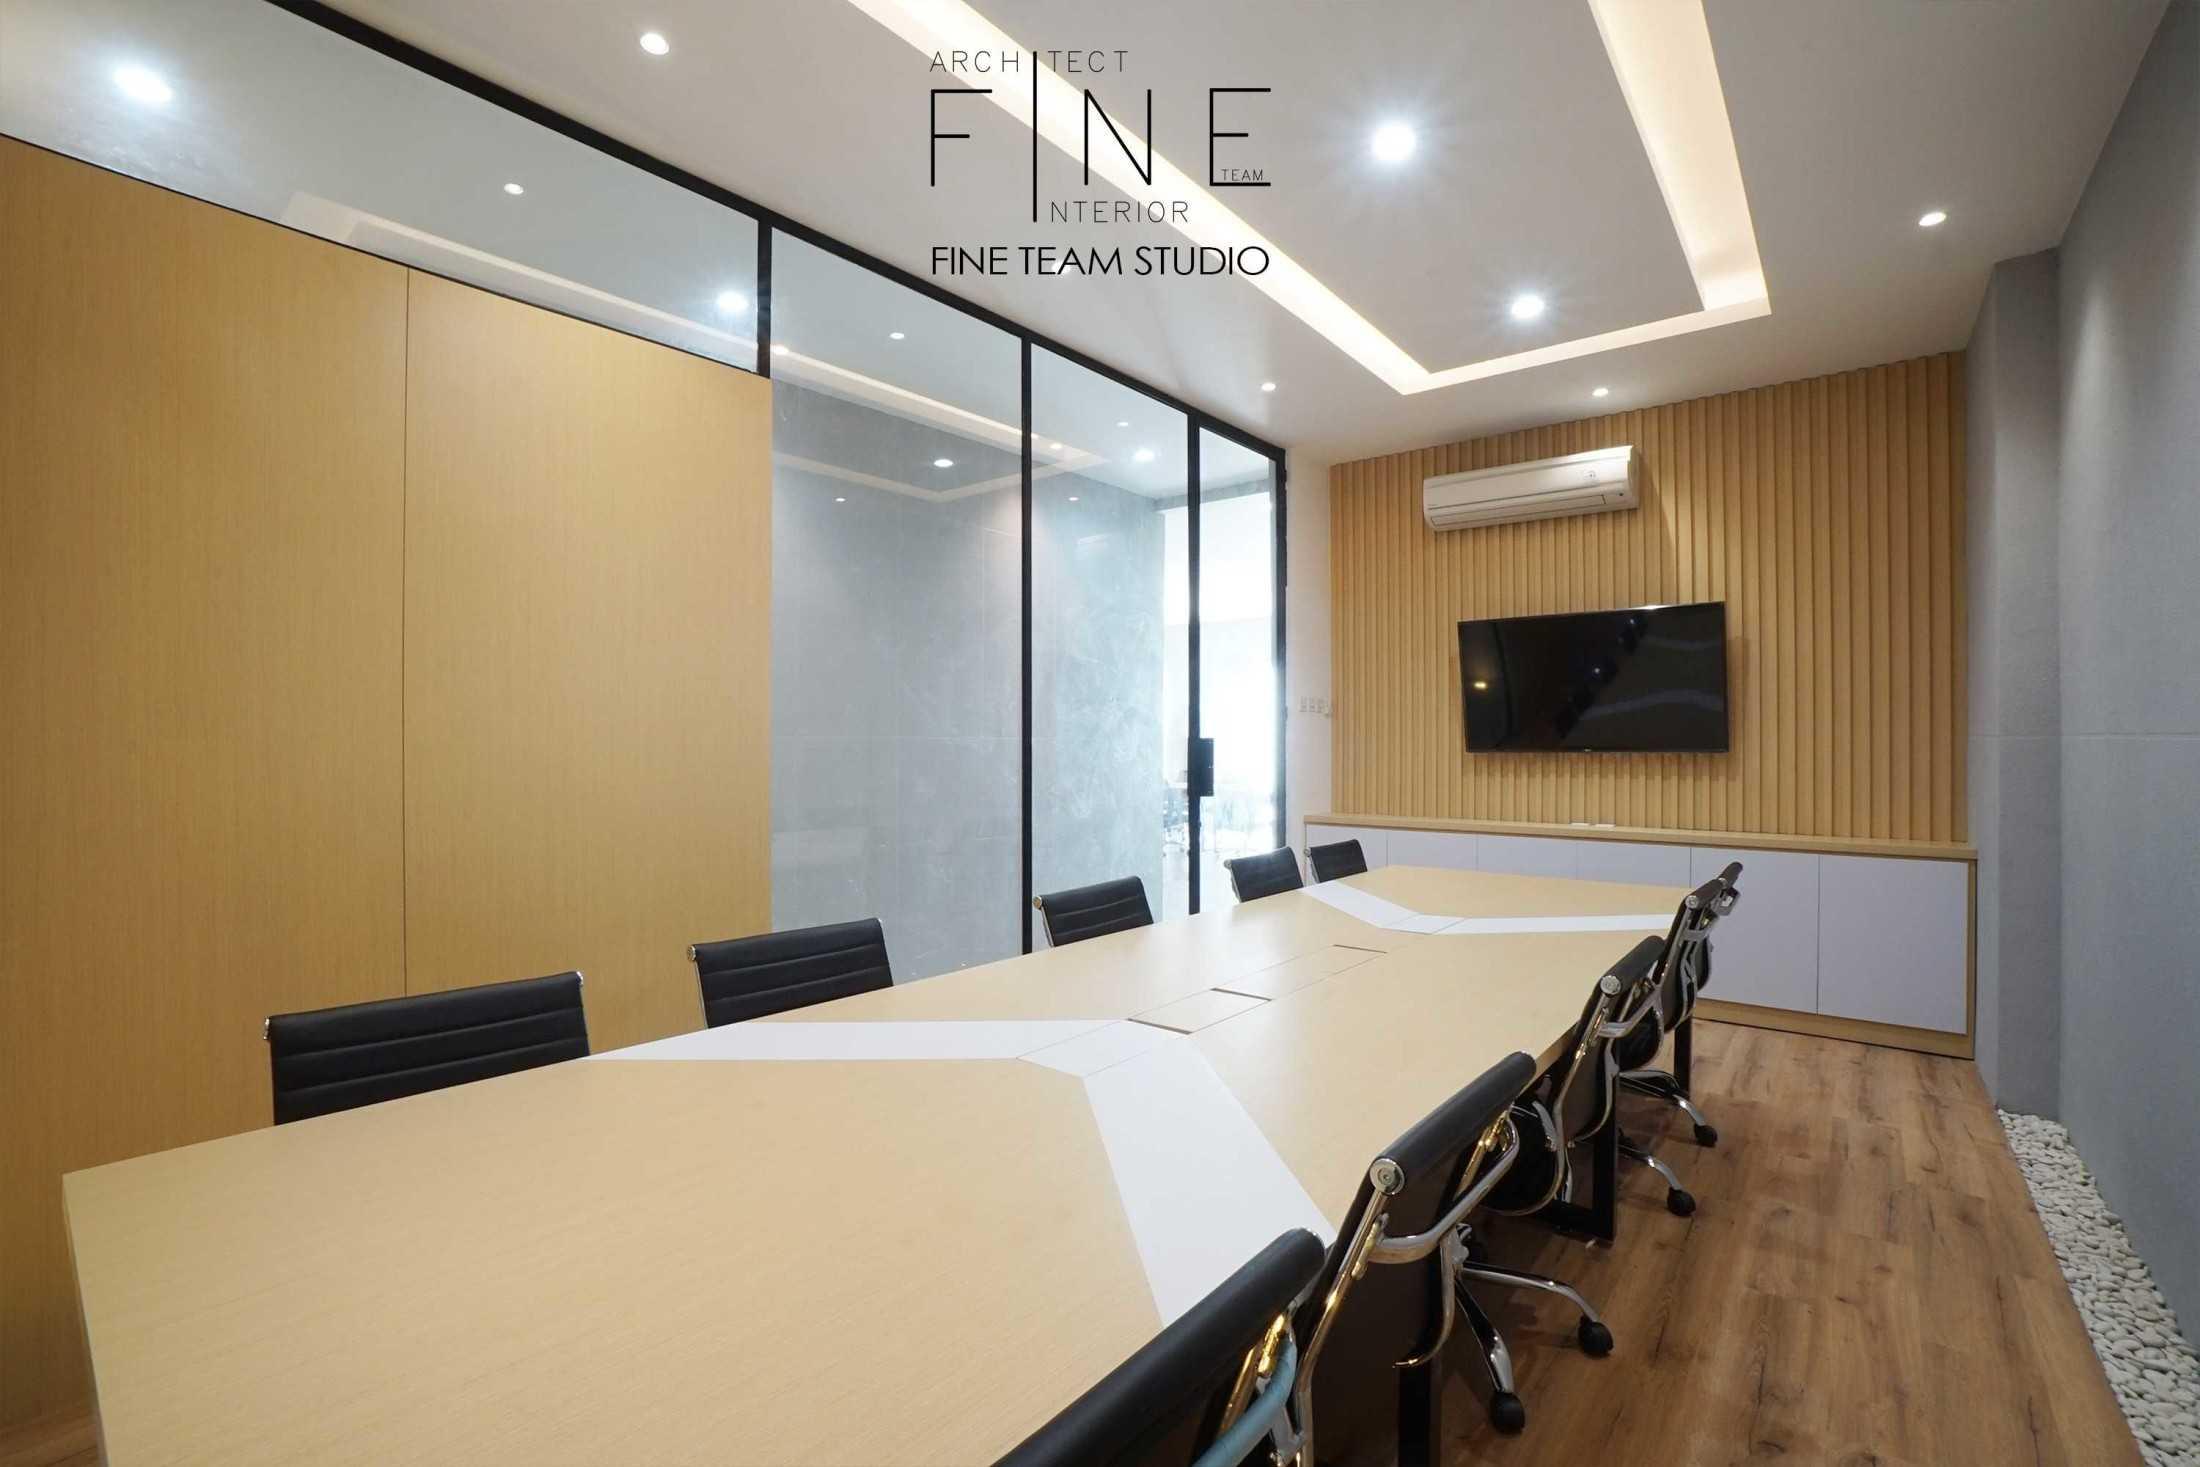 Fine Team Studio Mob Office Cikupa, Tangerang, Banten, Indonesia Cikupa, Tangerang, Banten, Indonesia Fine-Team-Studio-Mob-Office  71148